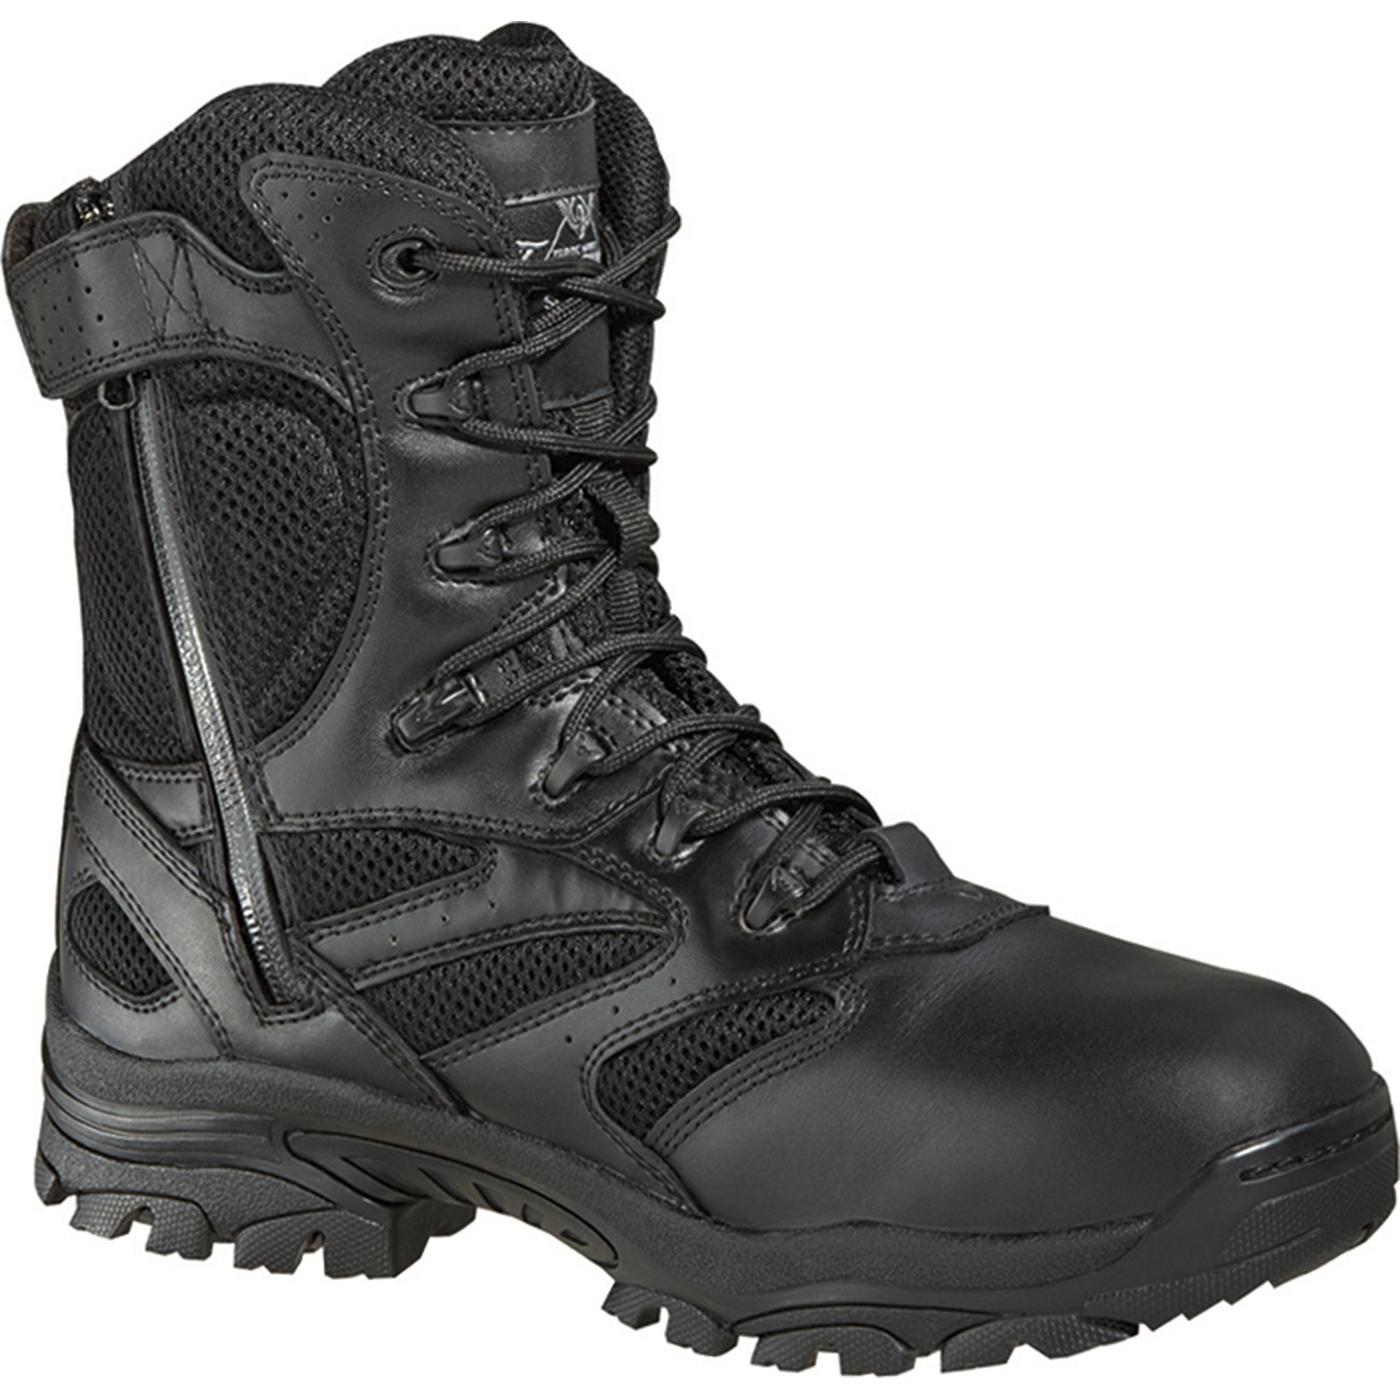 994badb97af Thorogood The Duece Waterproof Side Zip Duty Boot